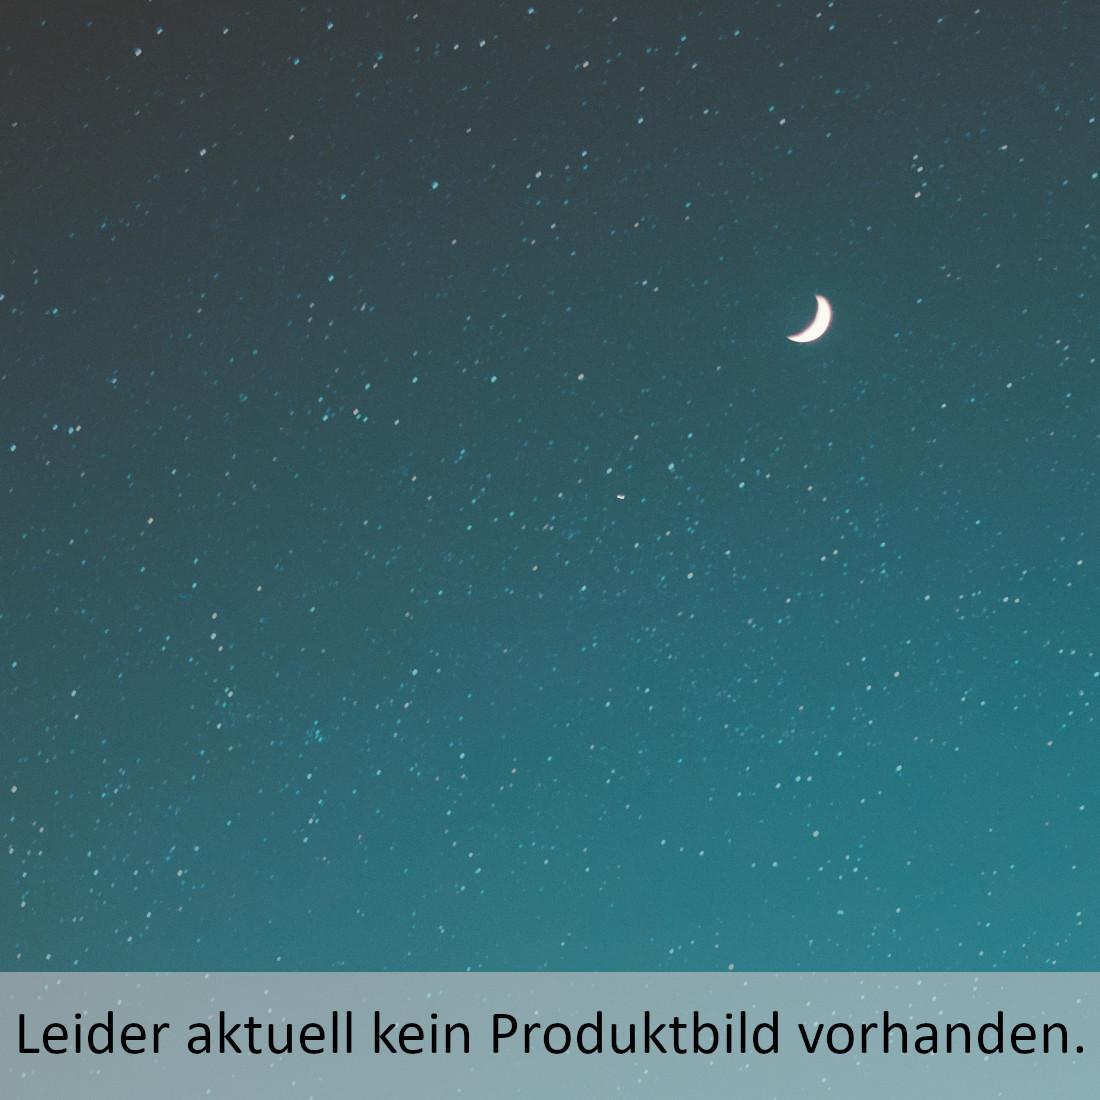 Kreative Resteküche Boss-Teichmann, Claudia 9783863360146